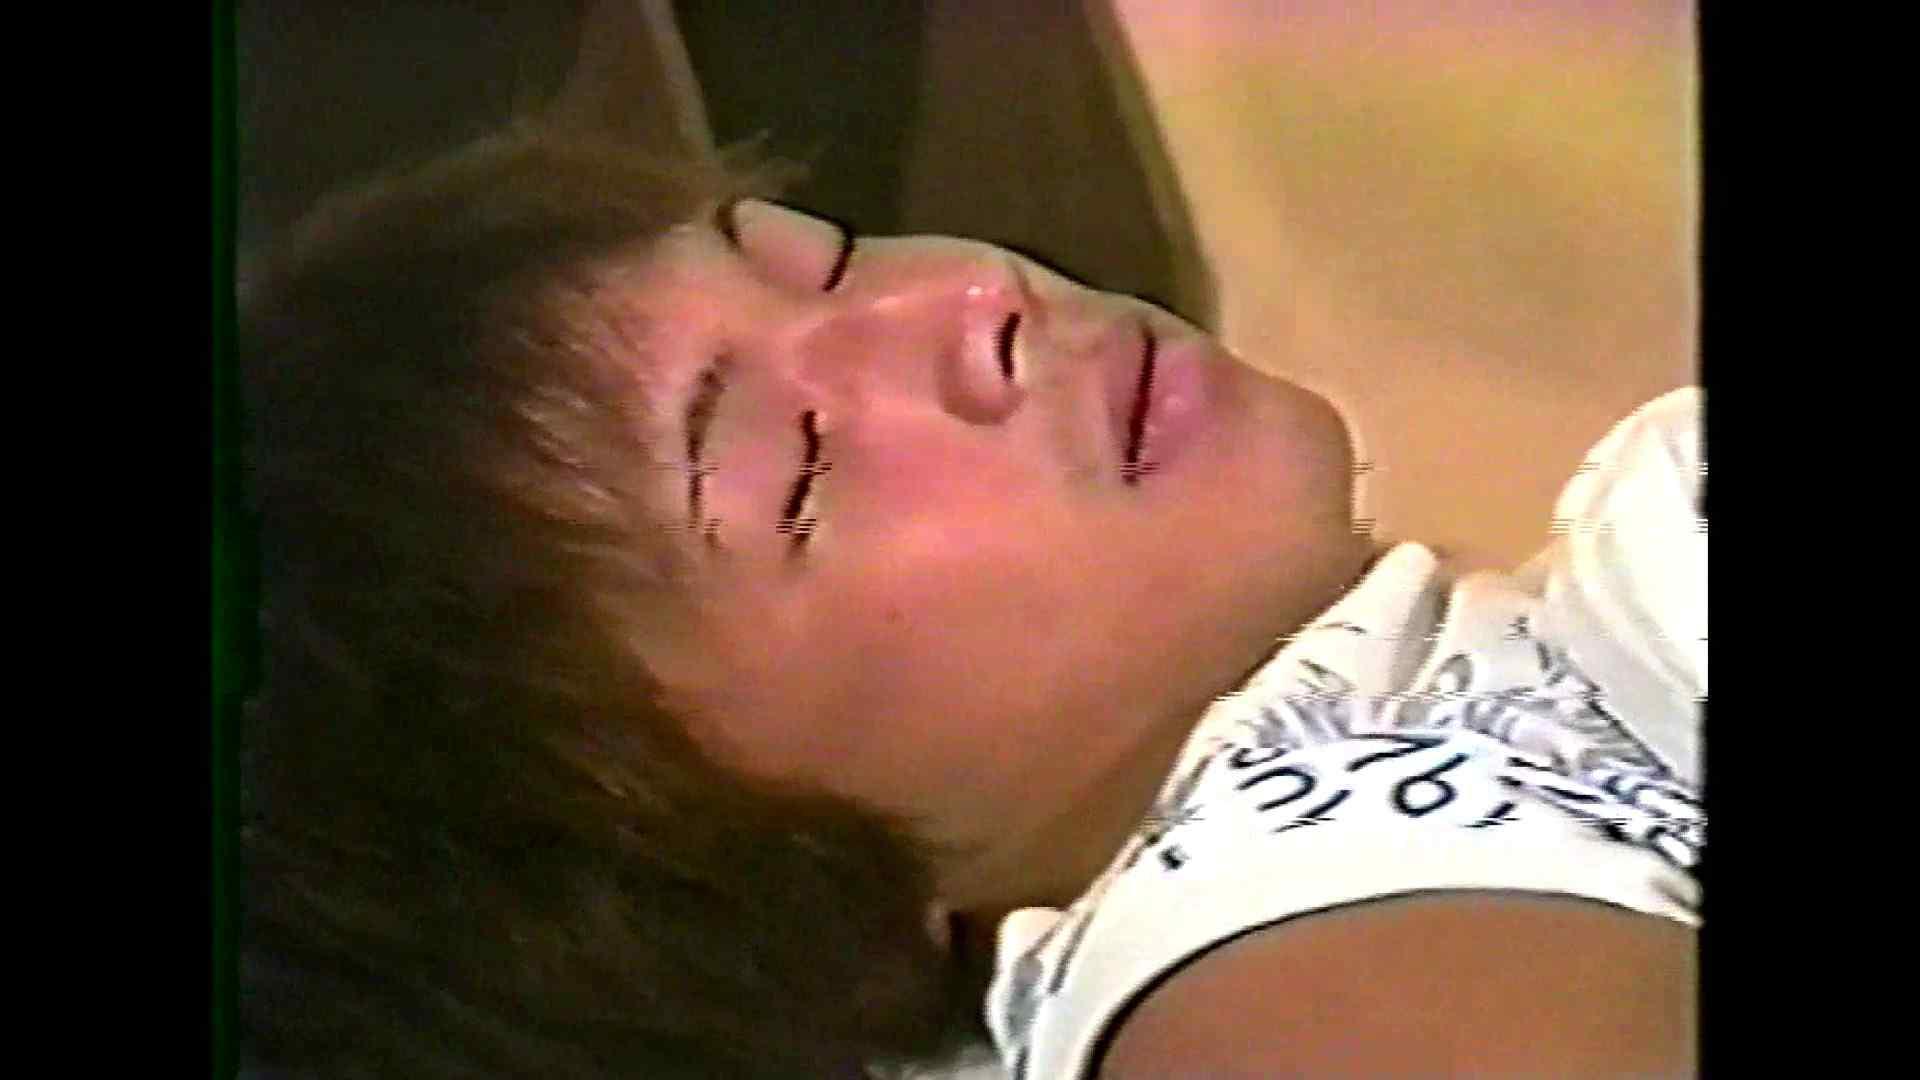 GAYBOY宏のオカズ倉庫Vol.3-1 まじ生挿入 | 口内に発射 ペニス画像 98pic 11